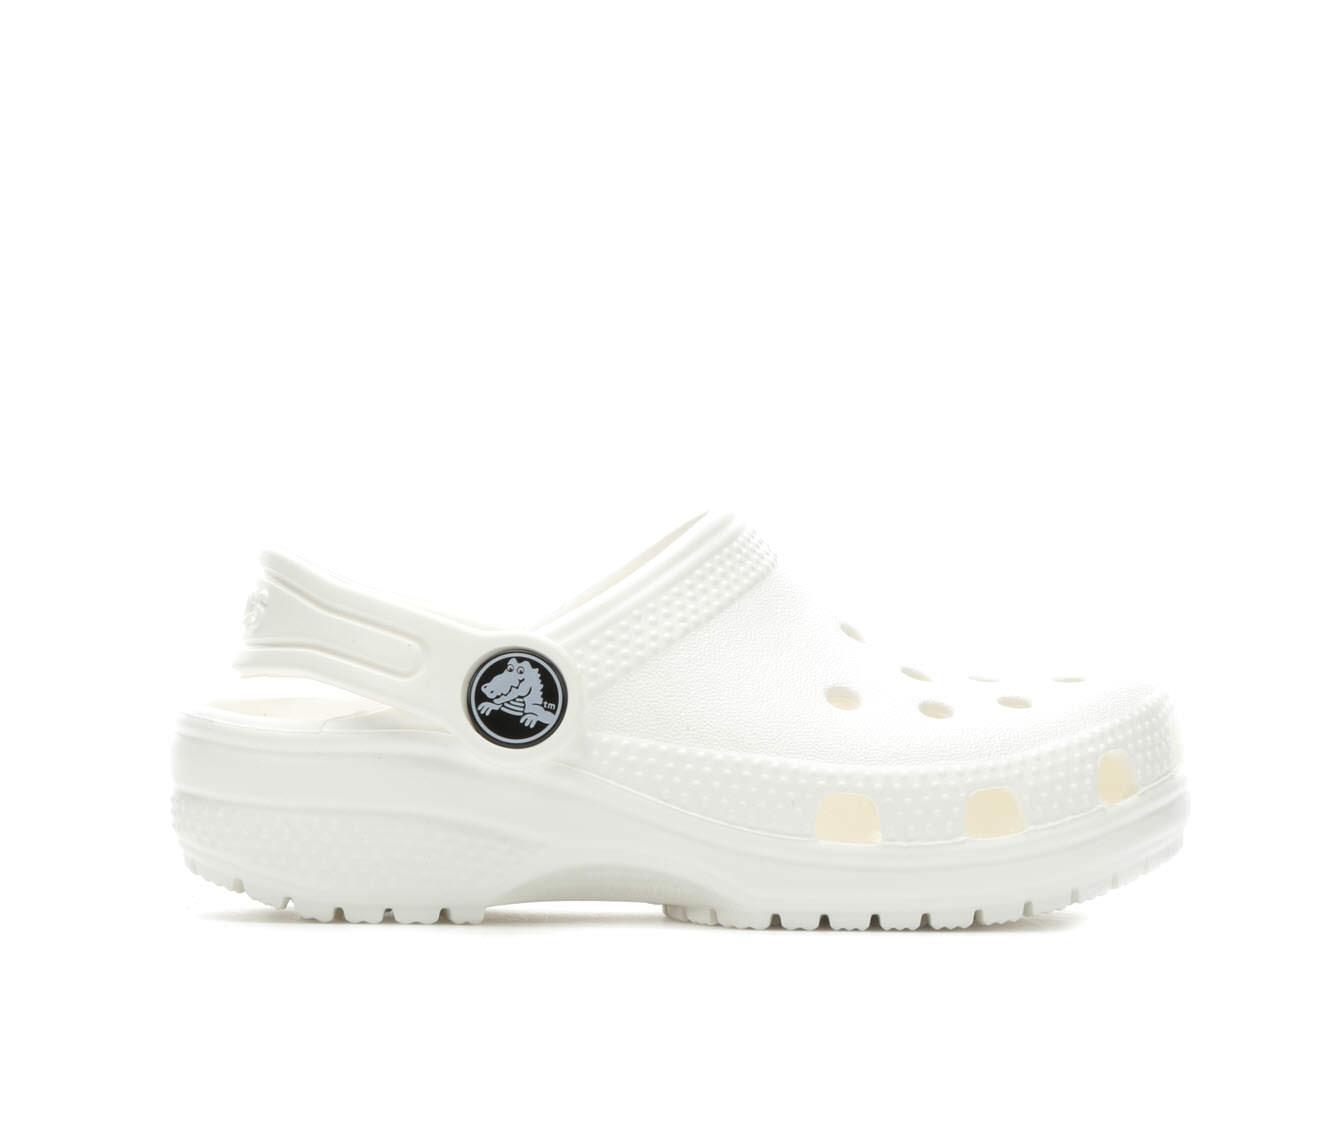 Girls' Crocs Classic Clog Children's Shoes (White)